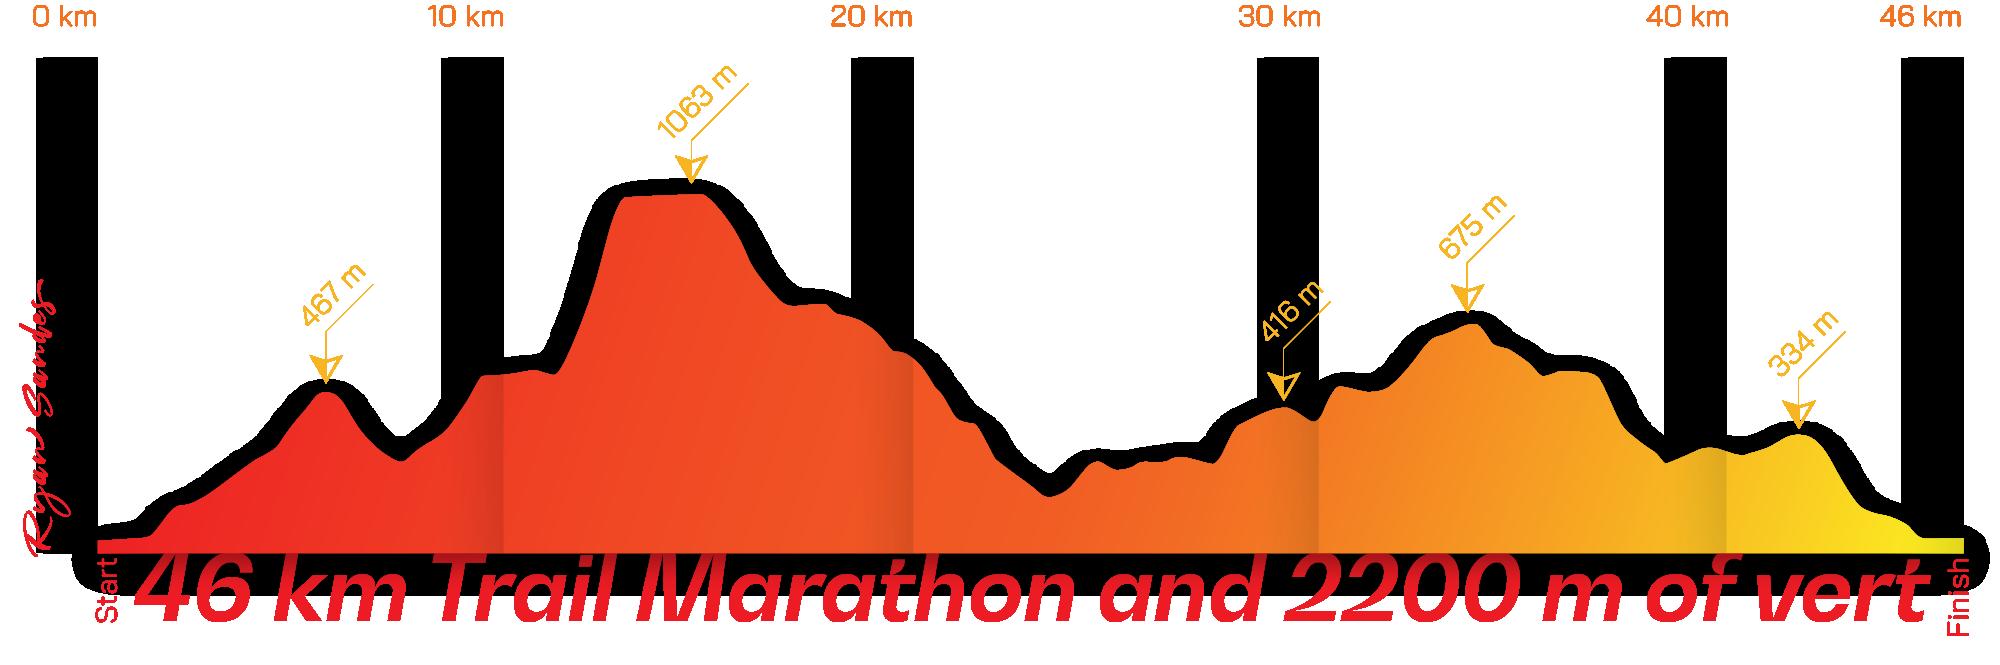 2021-Cape-Town-Marathon-Route-Profile